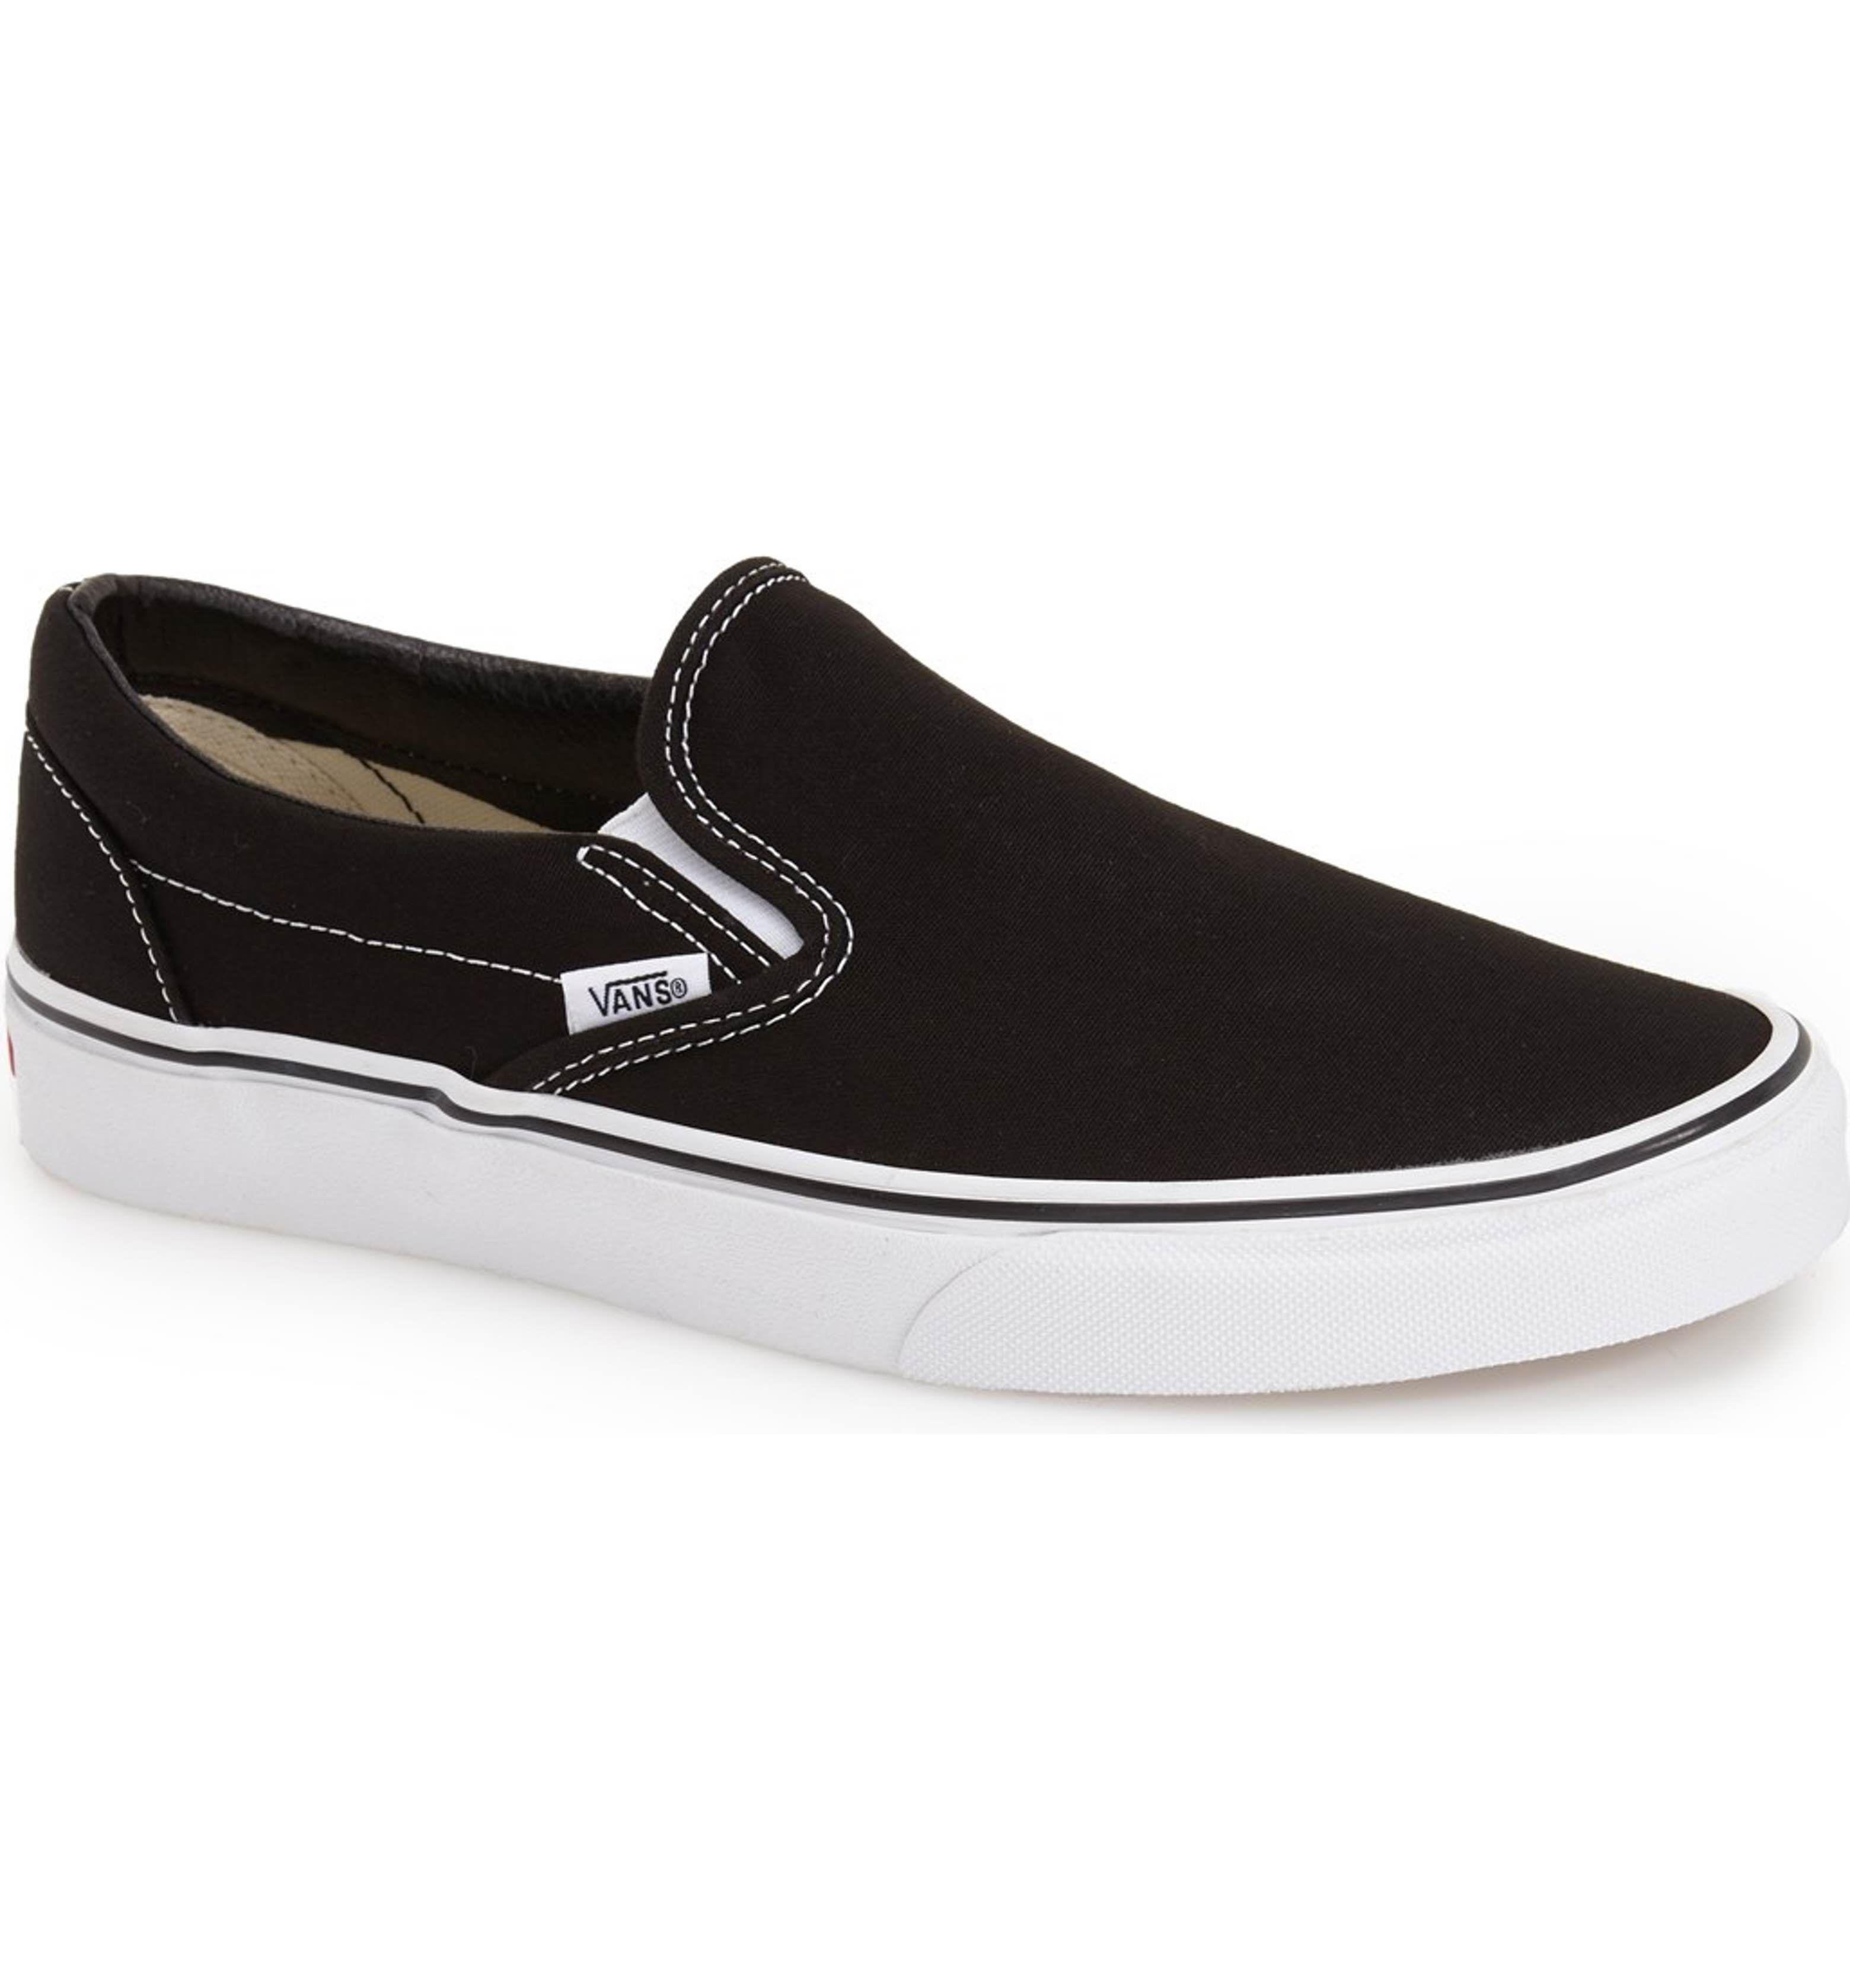 Main Image - Vans Classic Slip-On (Men) | Vans slip on, Vans ...